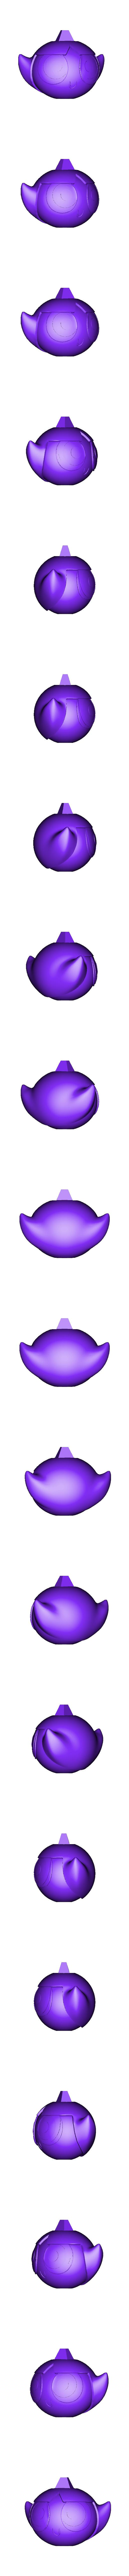 Green_Nana_-_Head.stl Télécharger fichier STL gratuit Super Nana Totem • Design imprimable en 3D, BODY3D